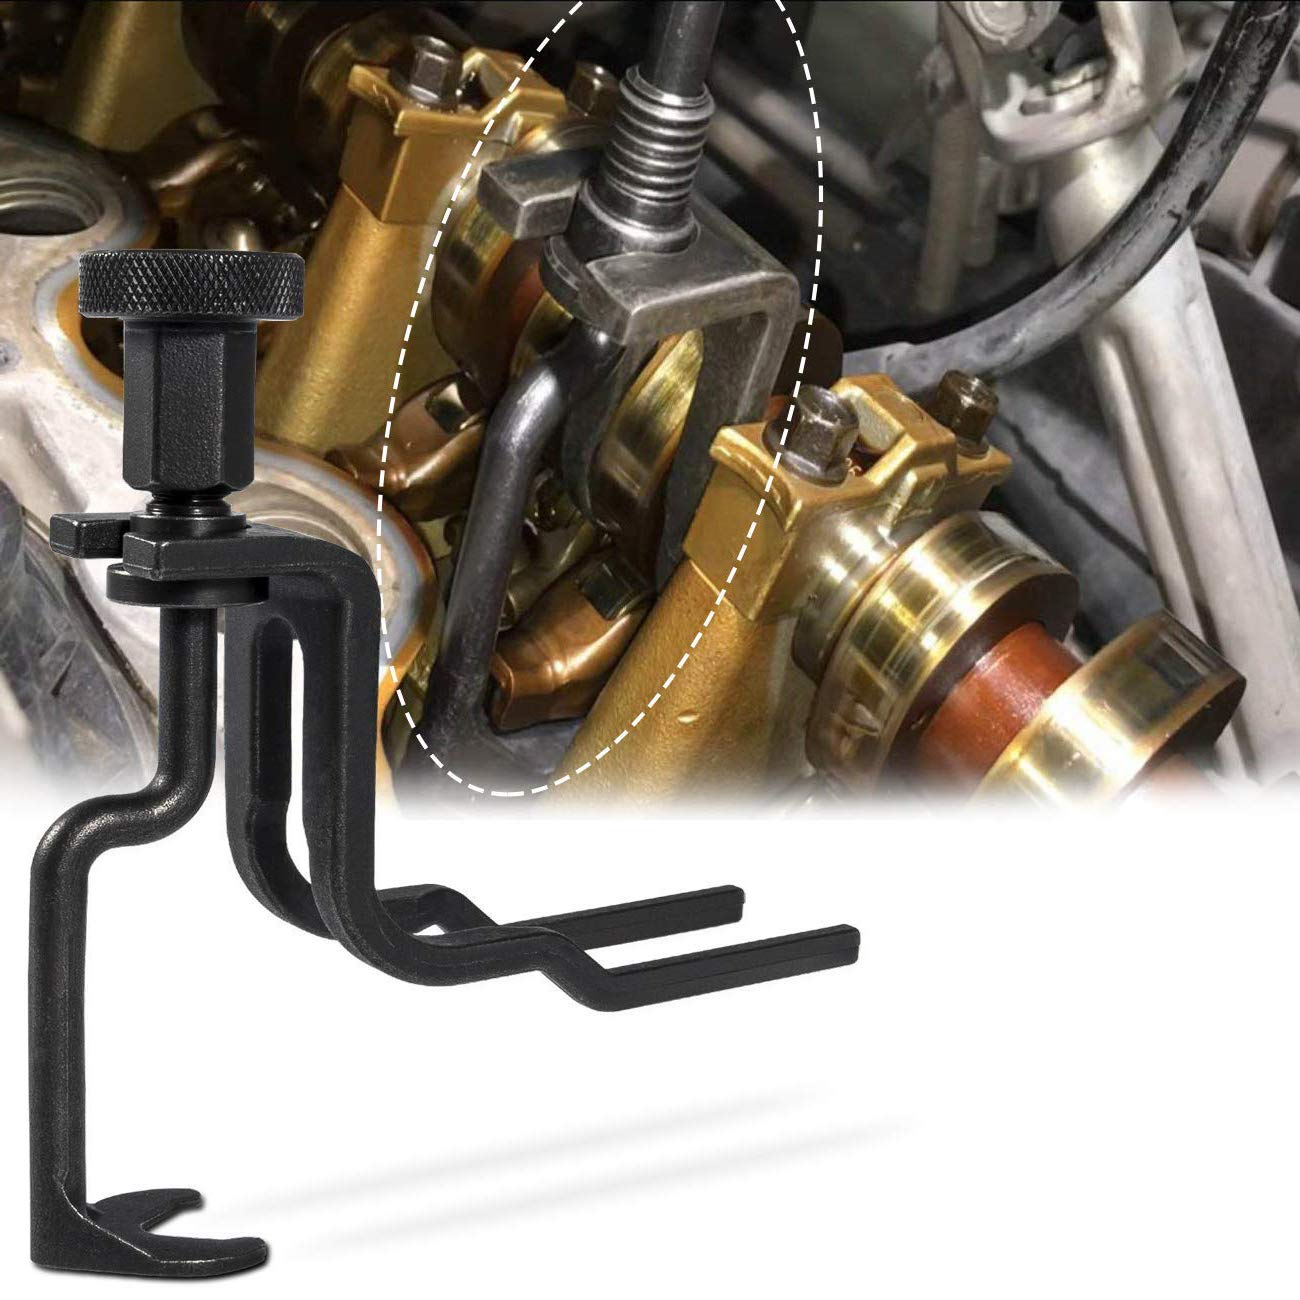 Retainer and Compression of Valve Springs in 4.6L 5.4L 6.8L 3V Ford Engines Rotunda 303-1039 for Camshaft Valve Seal Valve Spring Compressor Tool Similar to OTC 6684